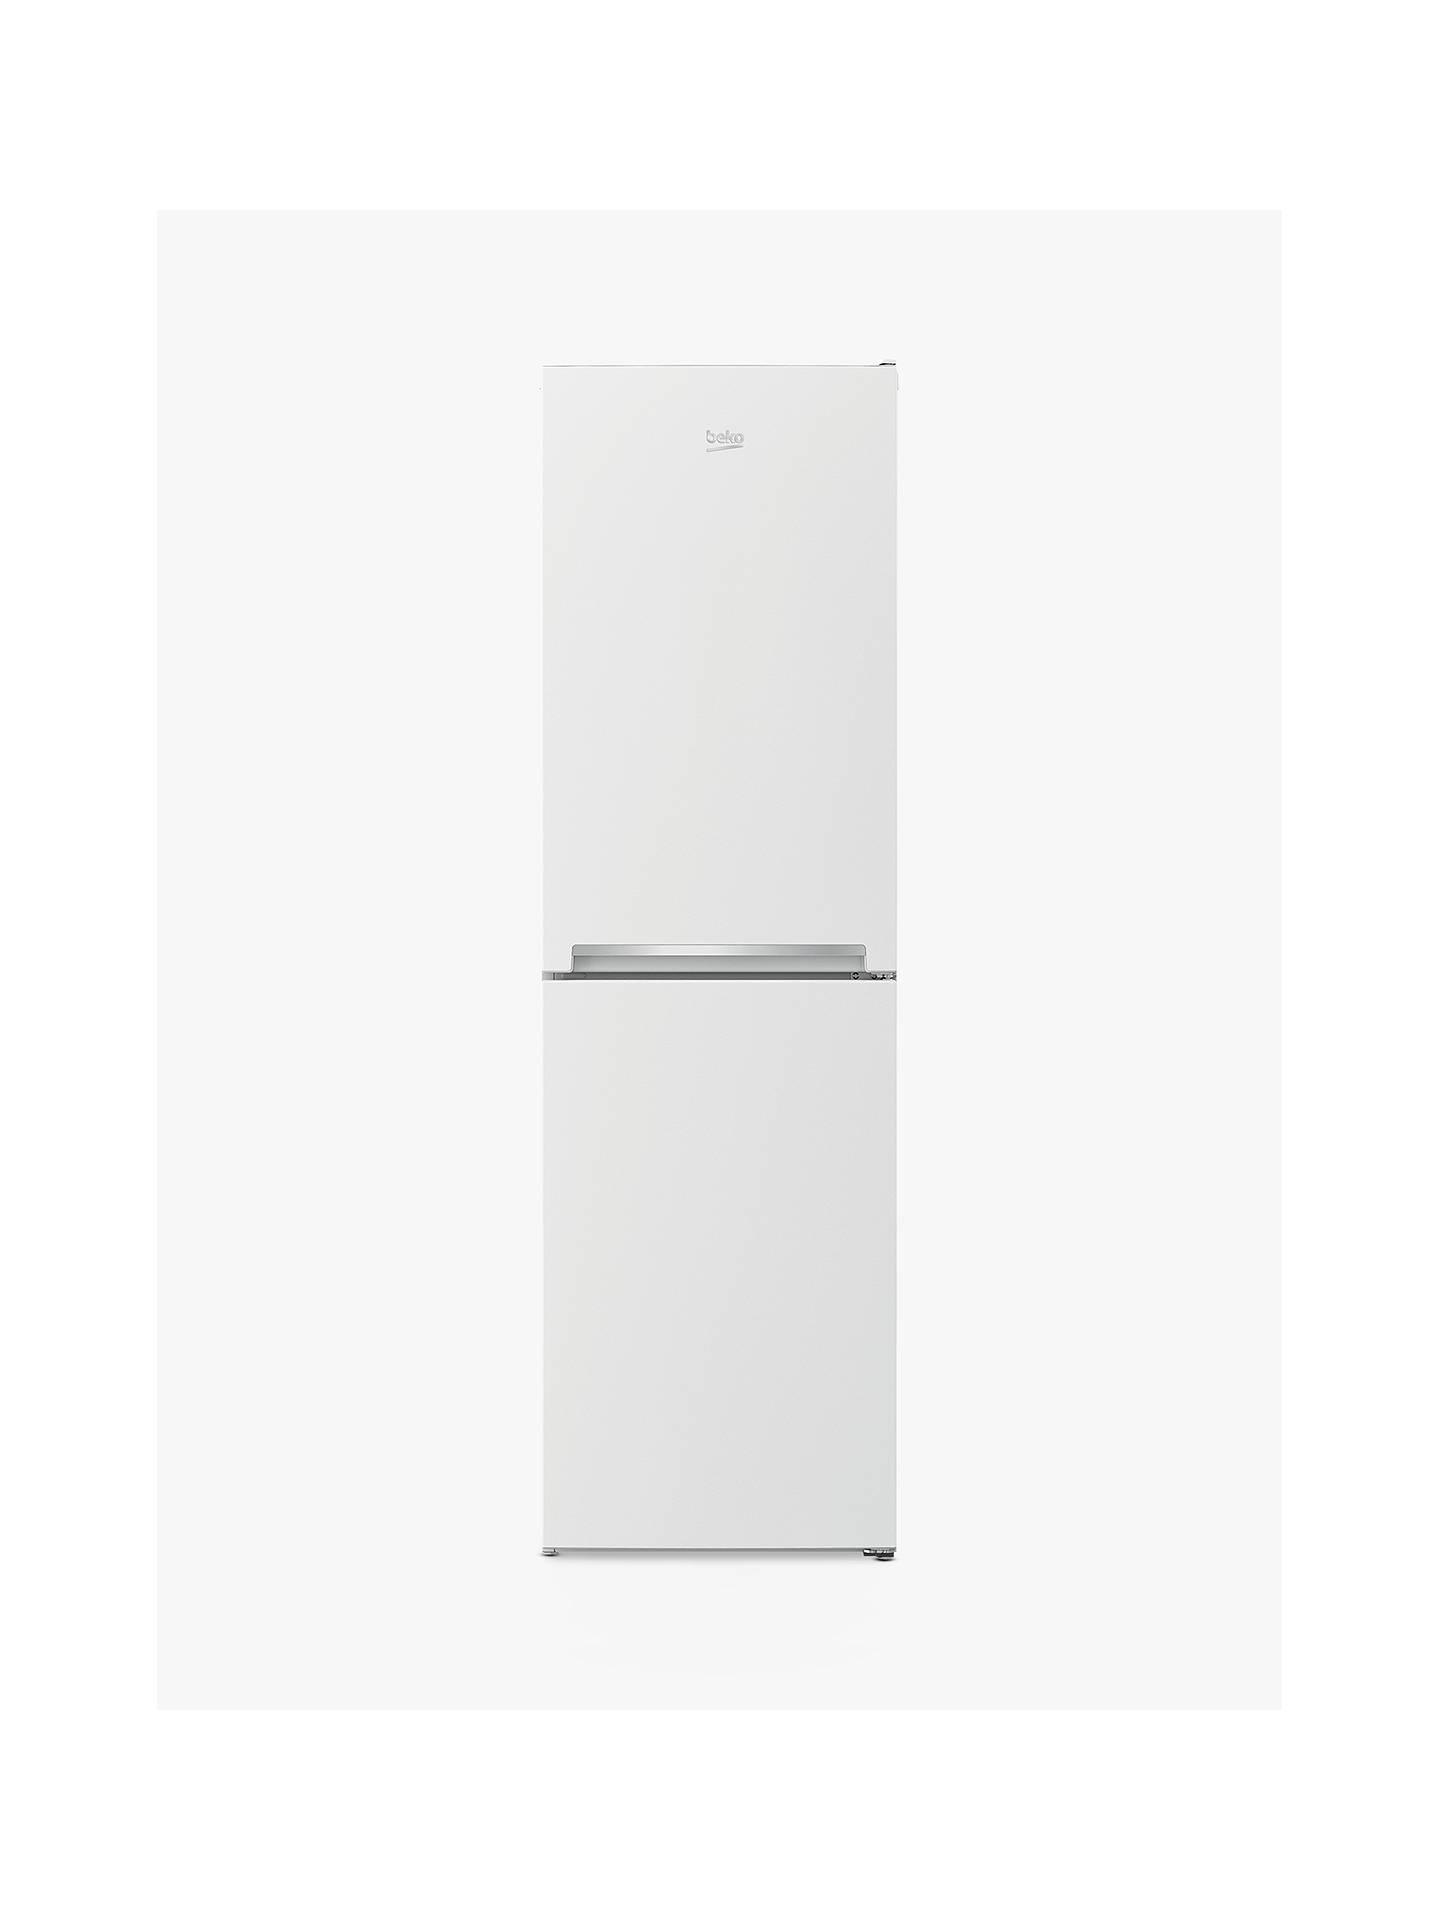 Beko Cjff1582 W Fridge Freezer, A+ Energy Rating, 54cm Wide, White by Beko